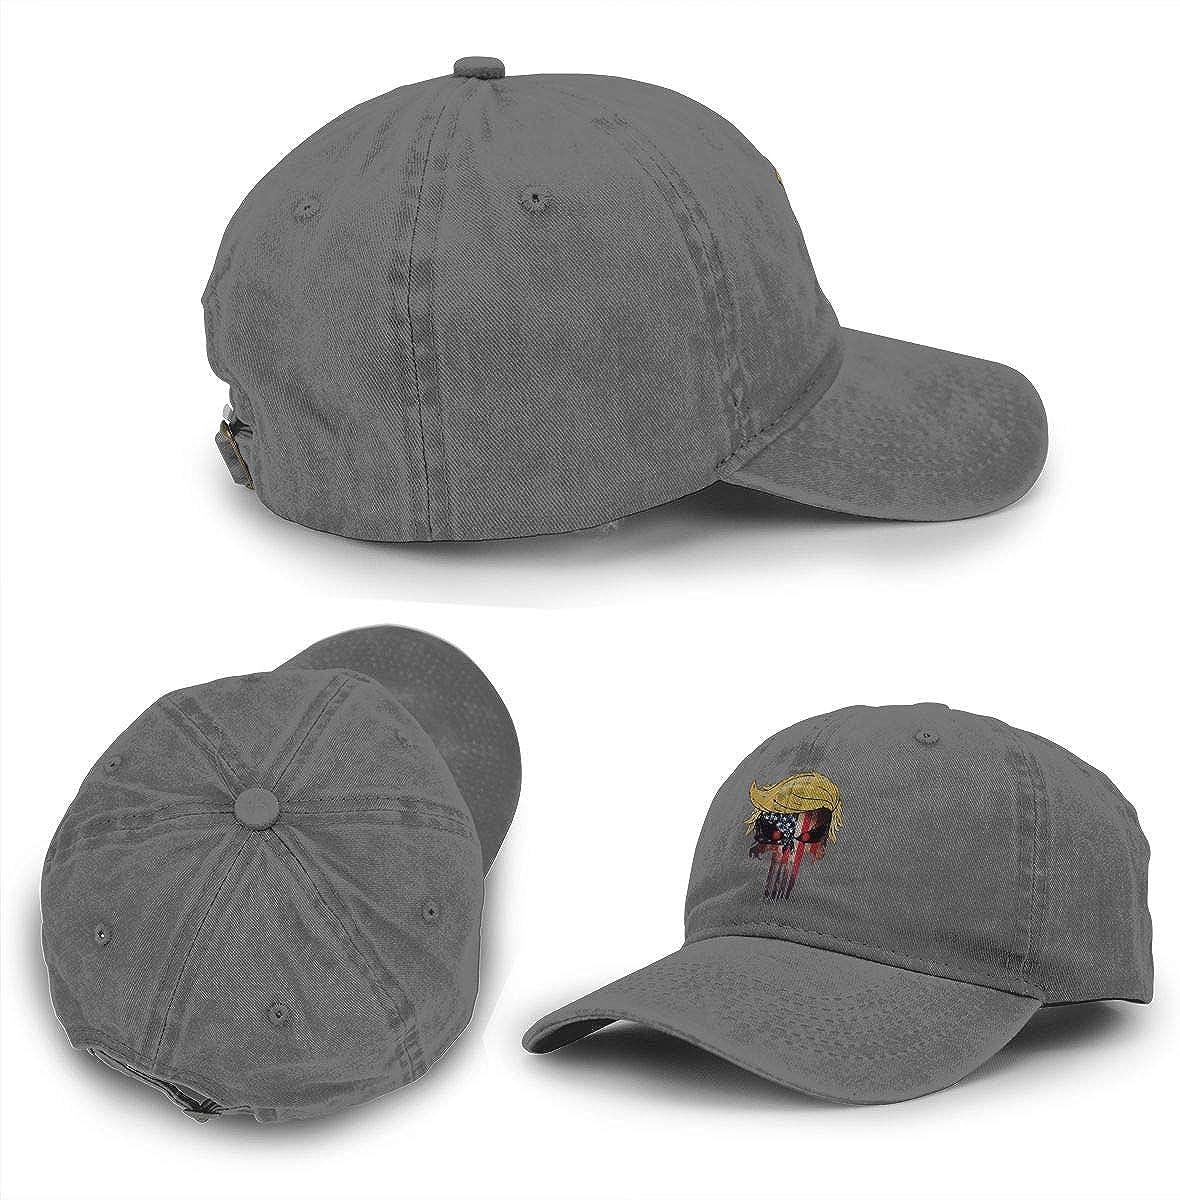 Trump Skull Adult Outdoor Vintage Cotton Cowboy Hat Sports Trucker Hat Baseball Cap